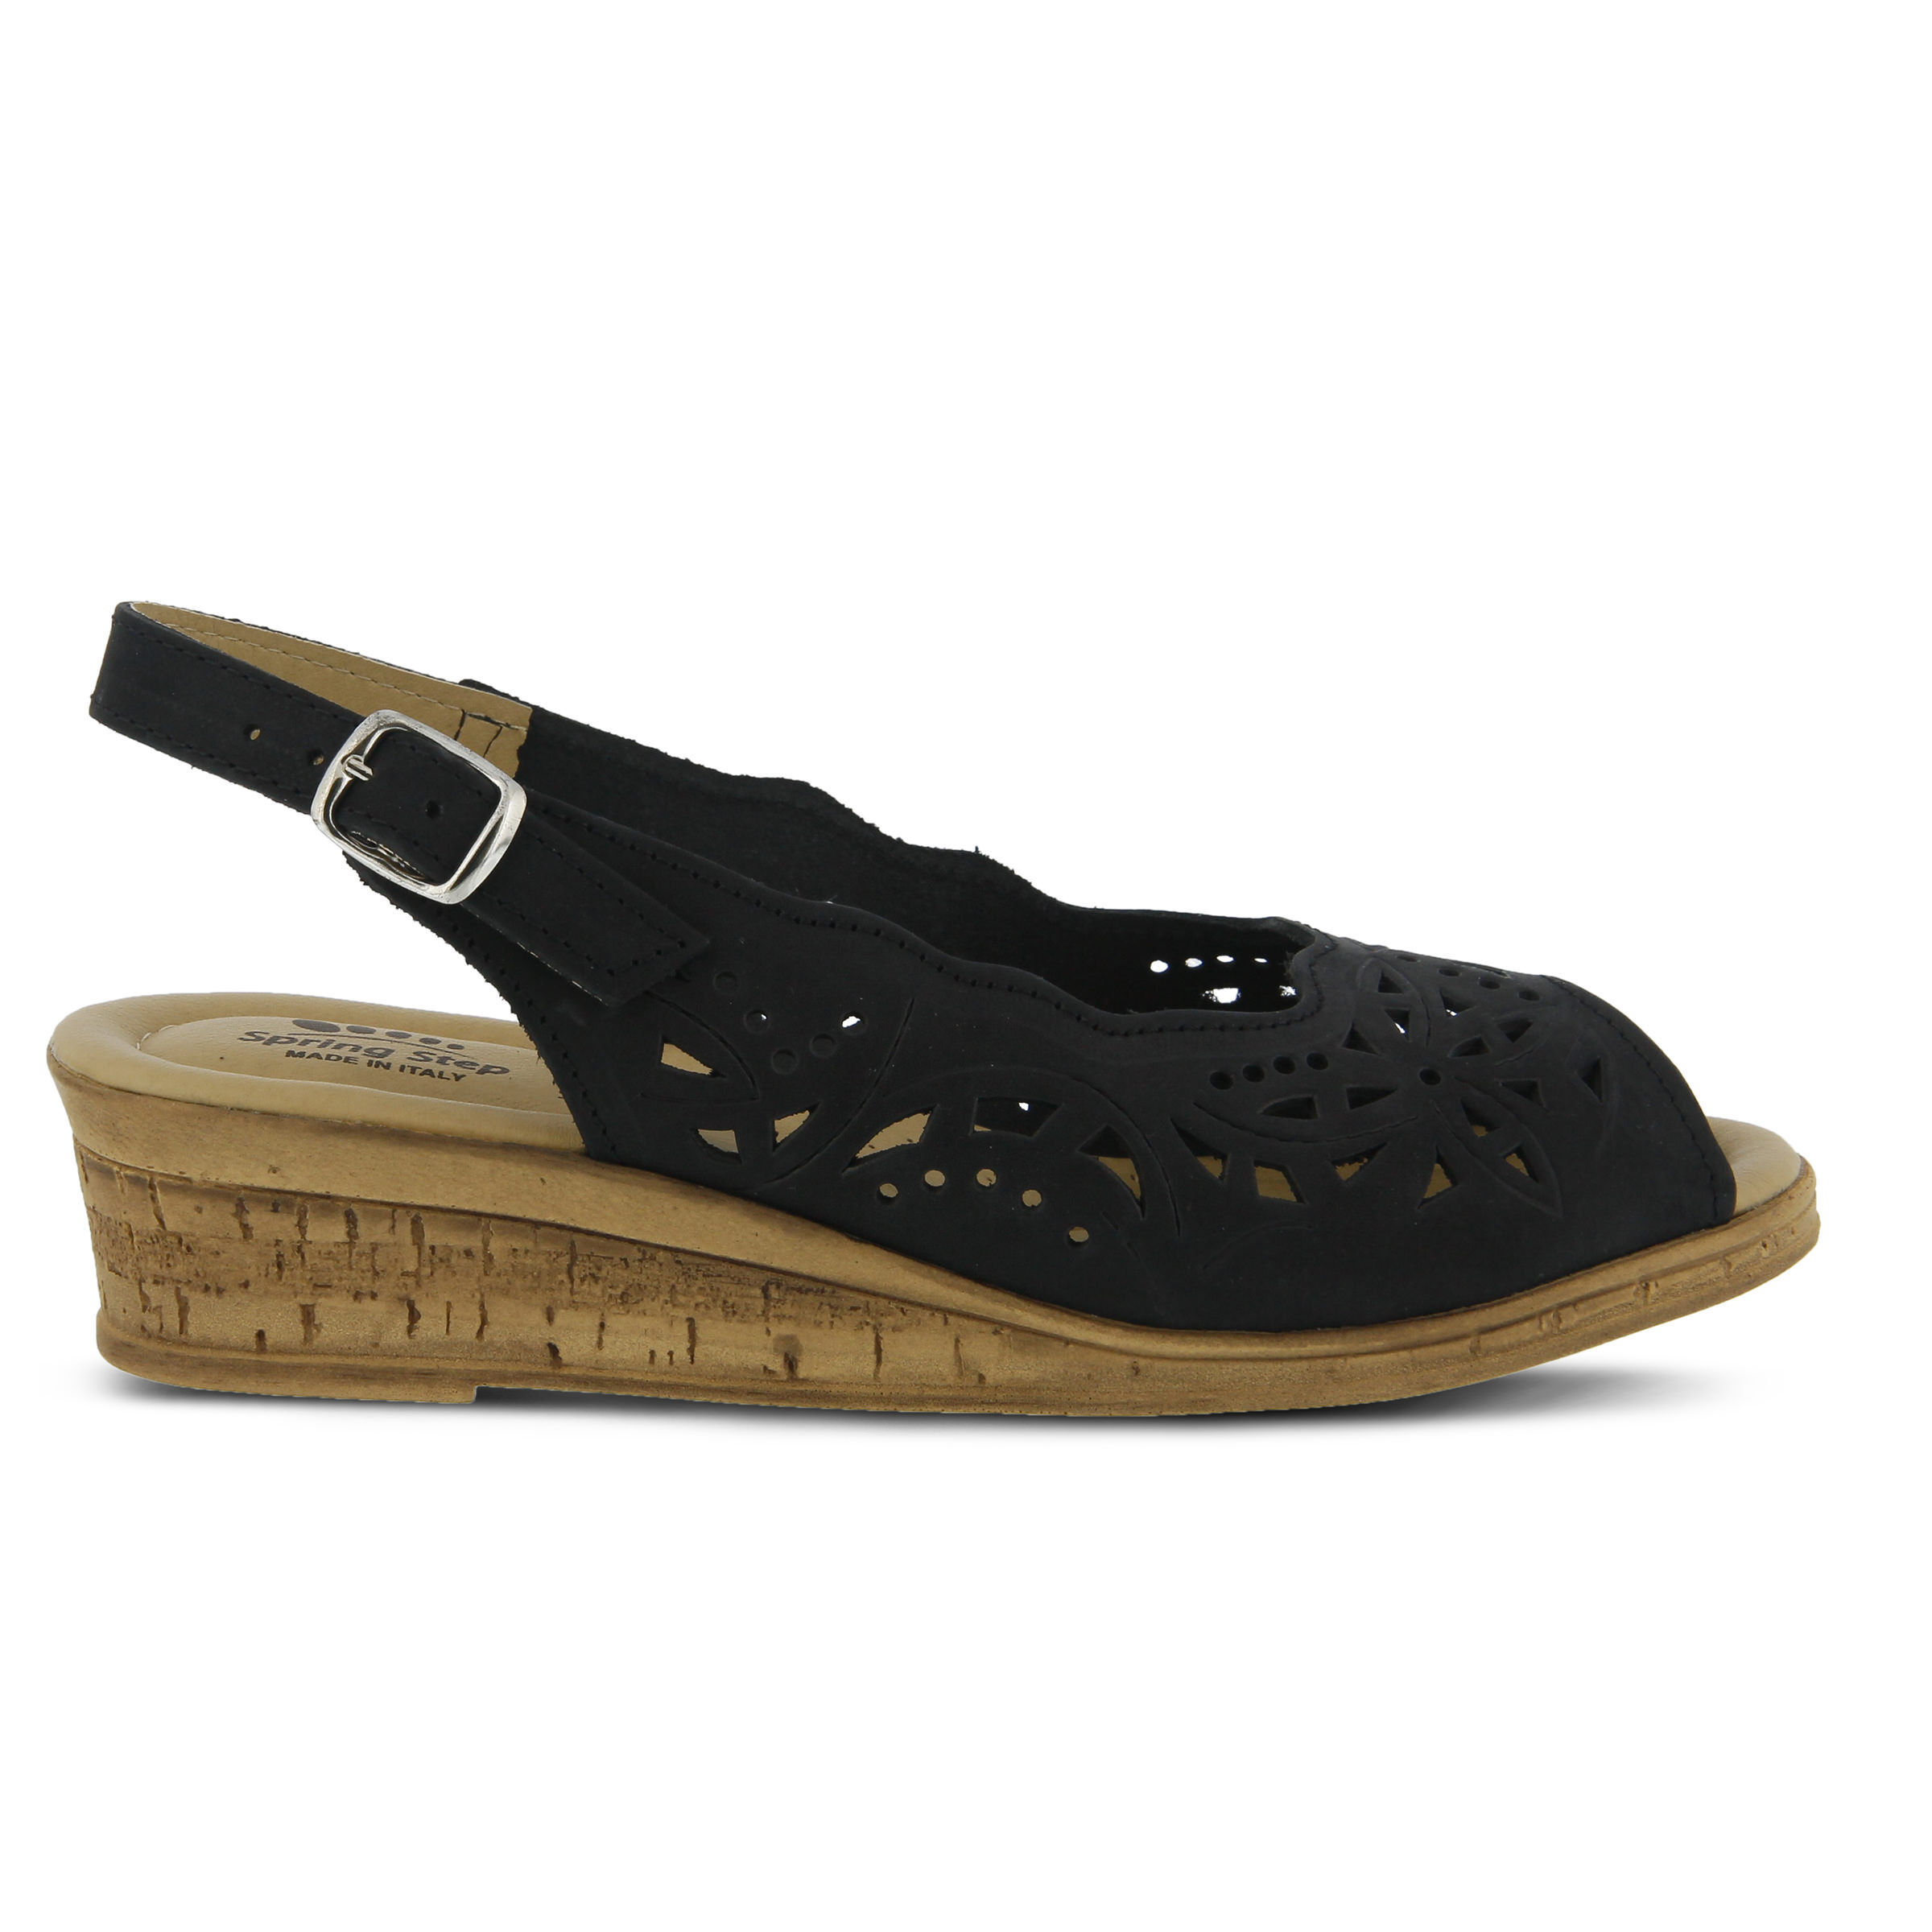 uk shoes_kd7372